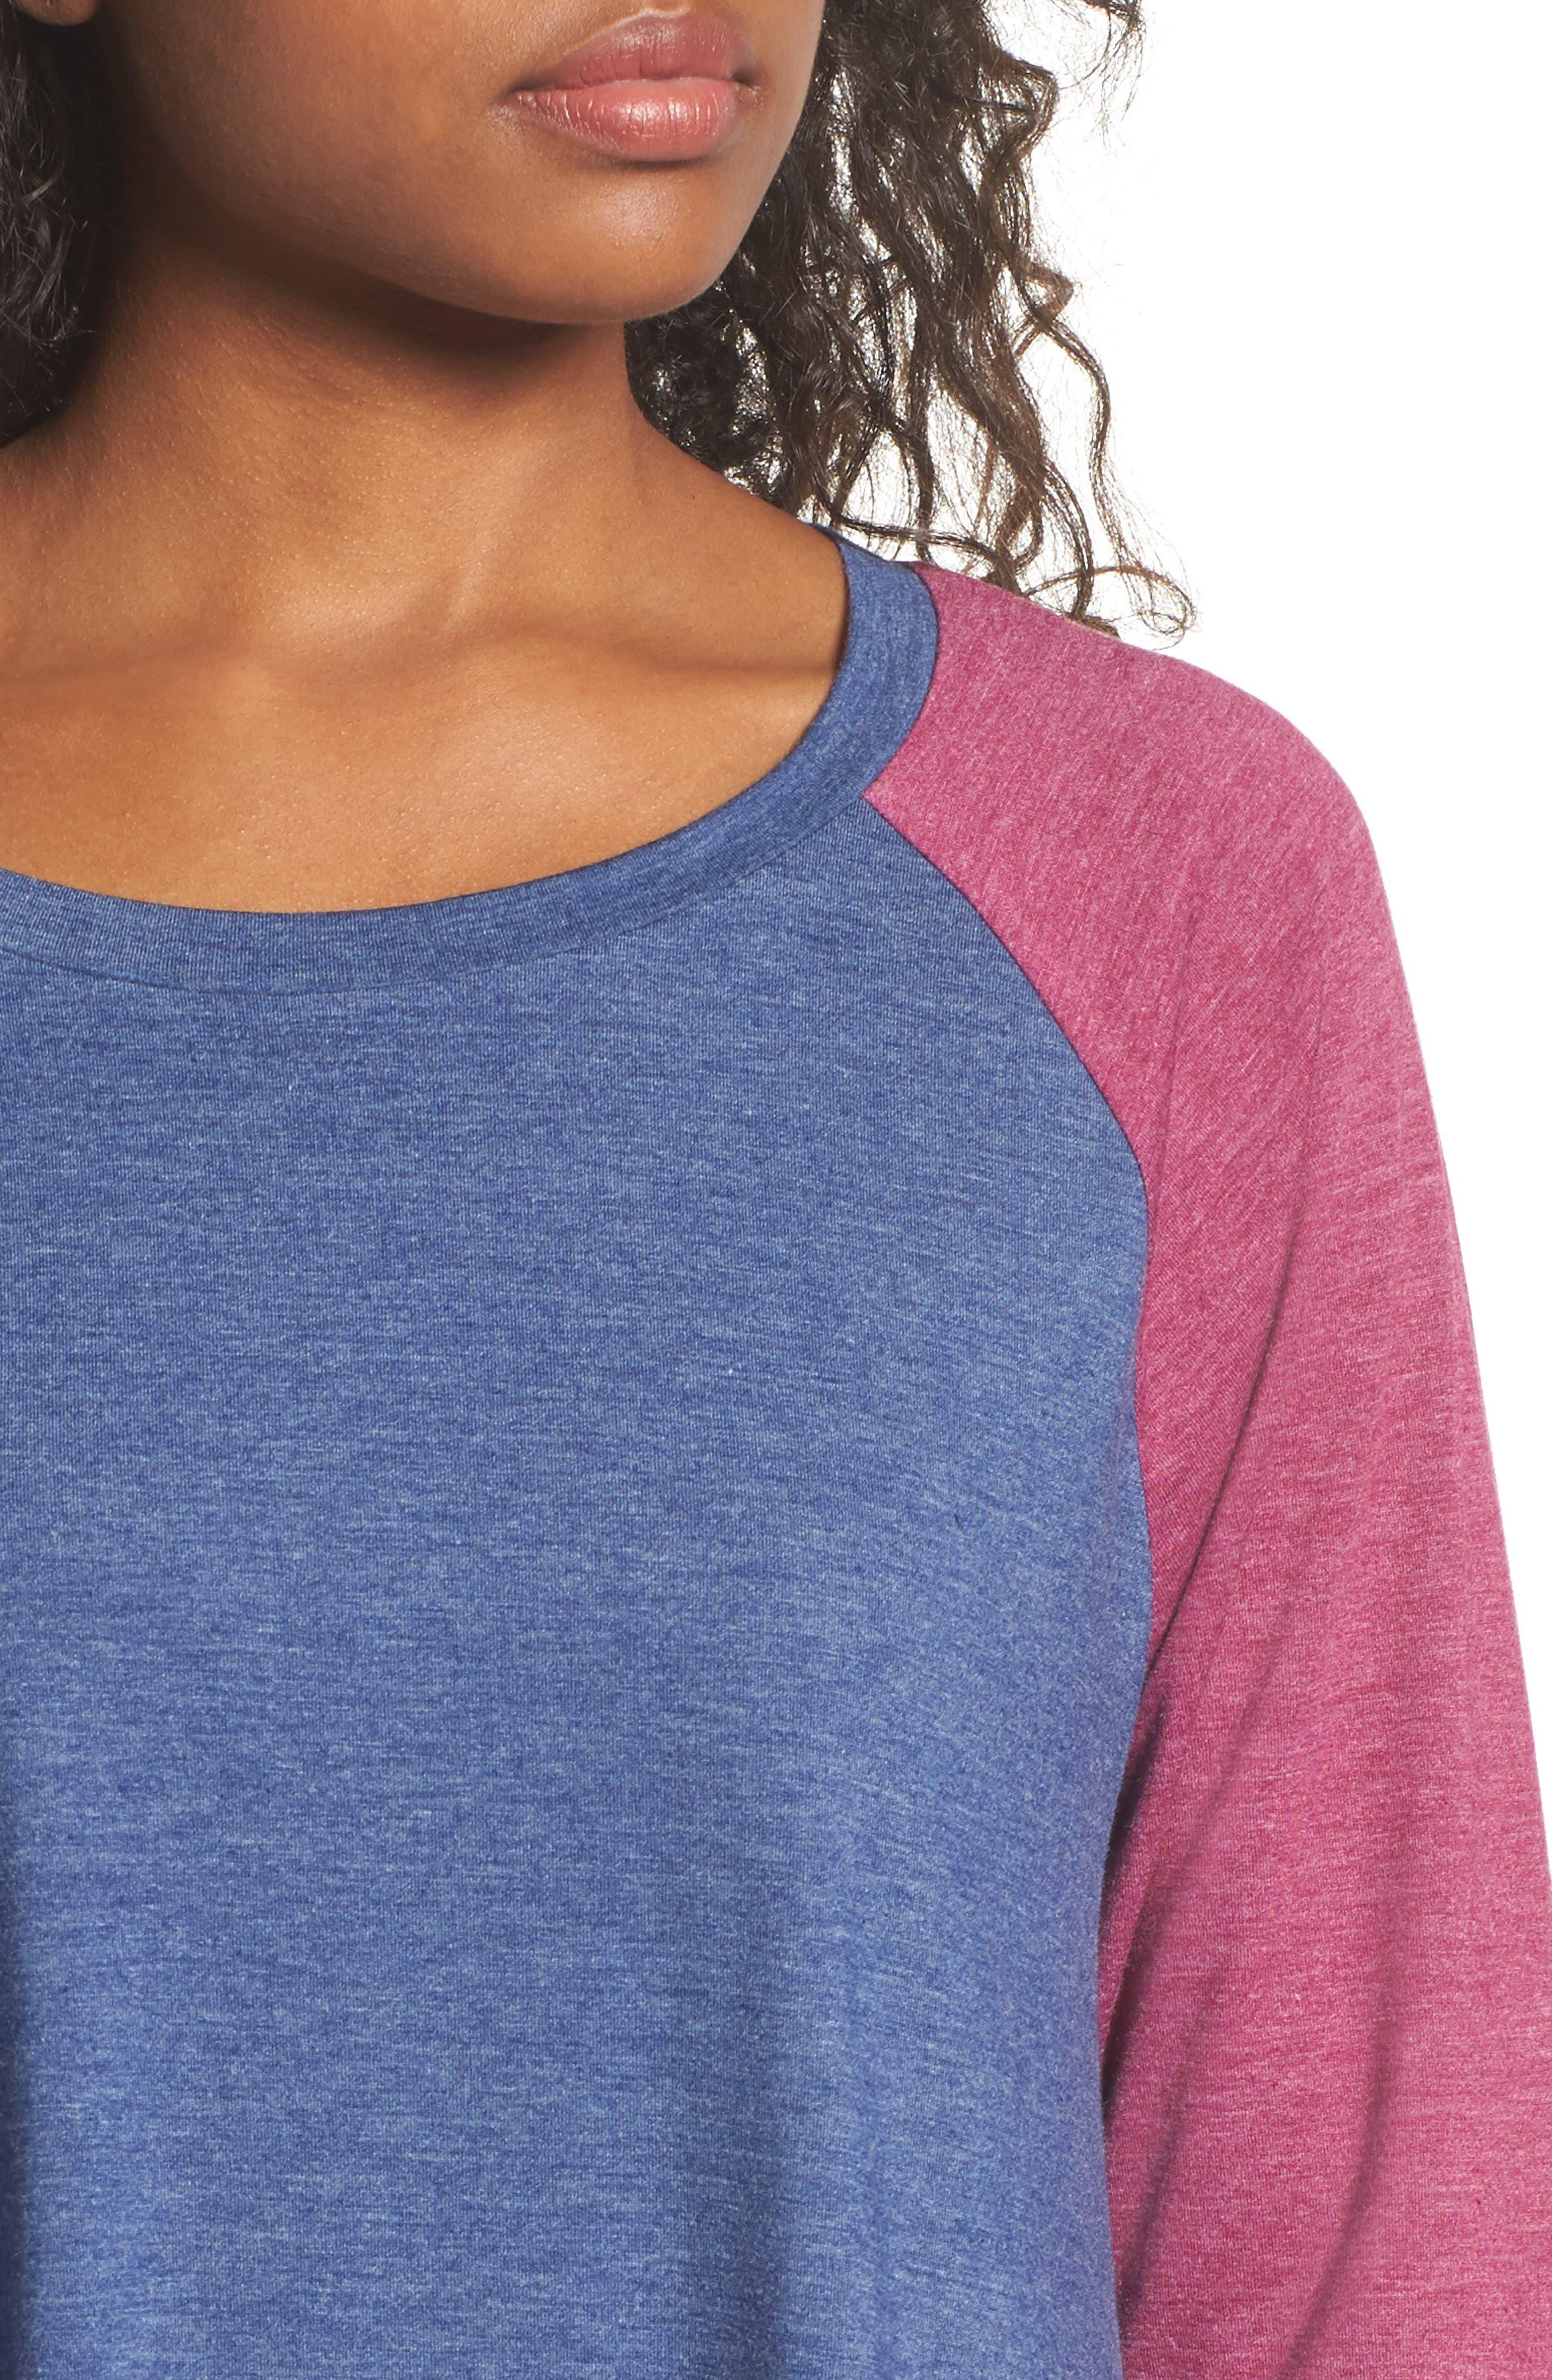 Honeydew All American Sleep Shirt,                             Alternate thumbnail 26, color,